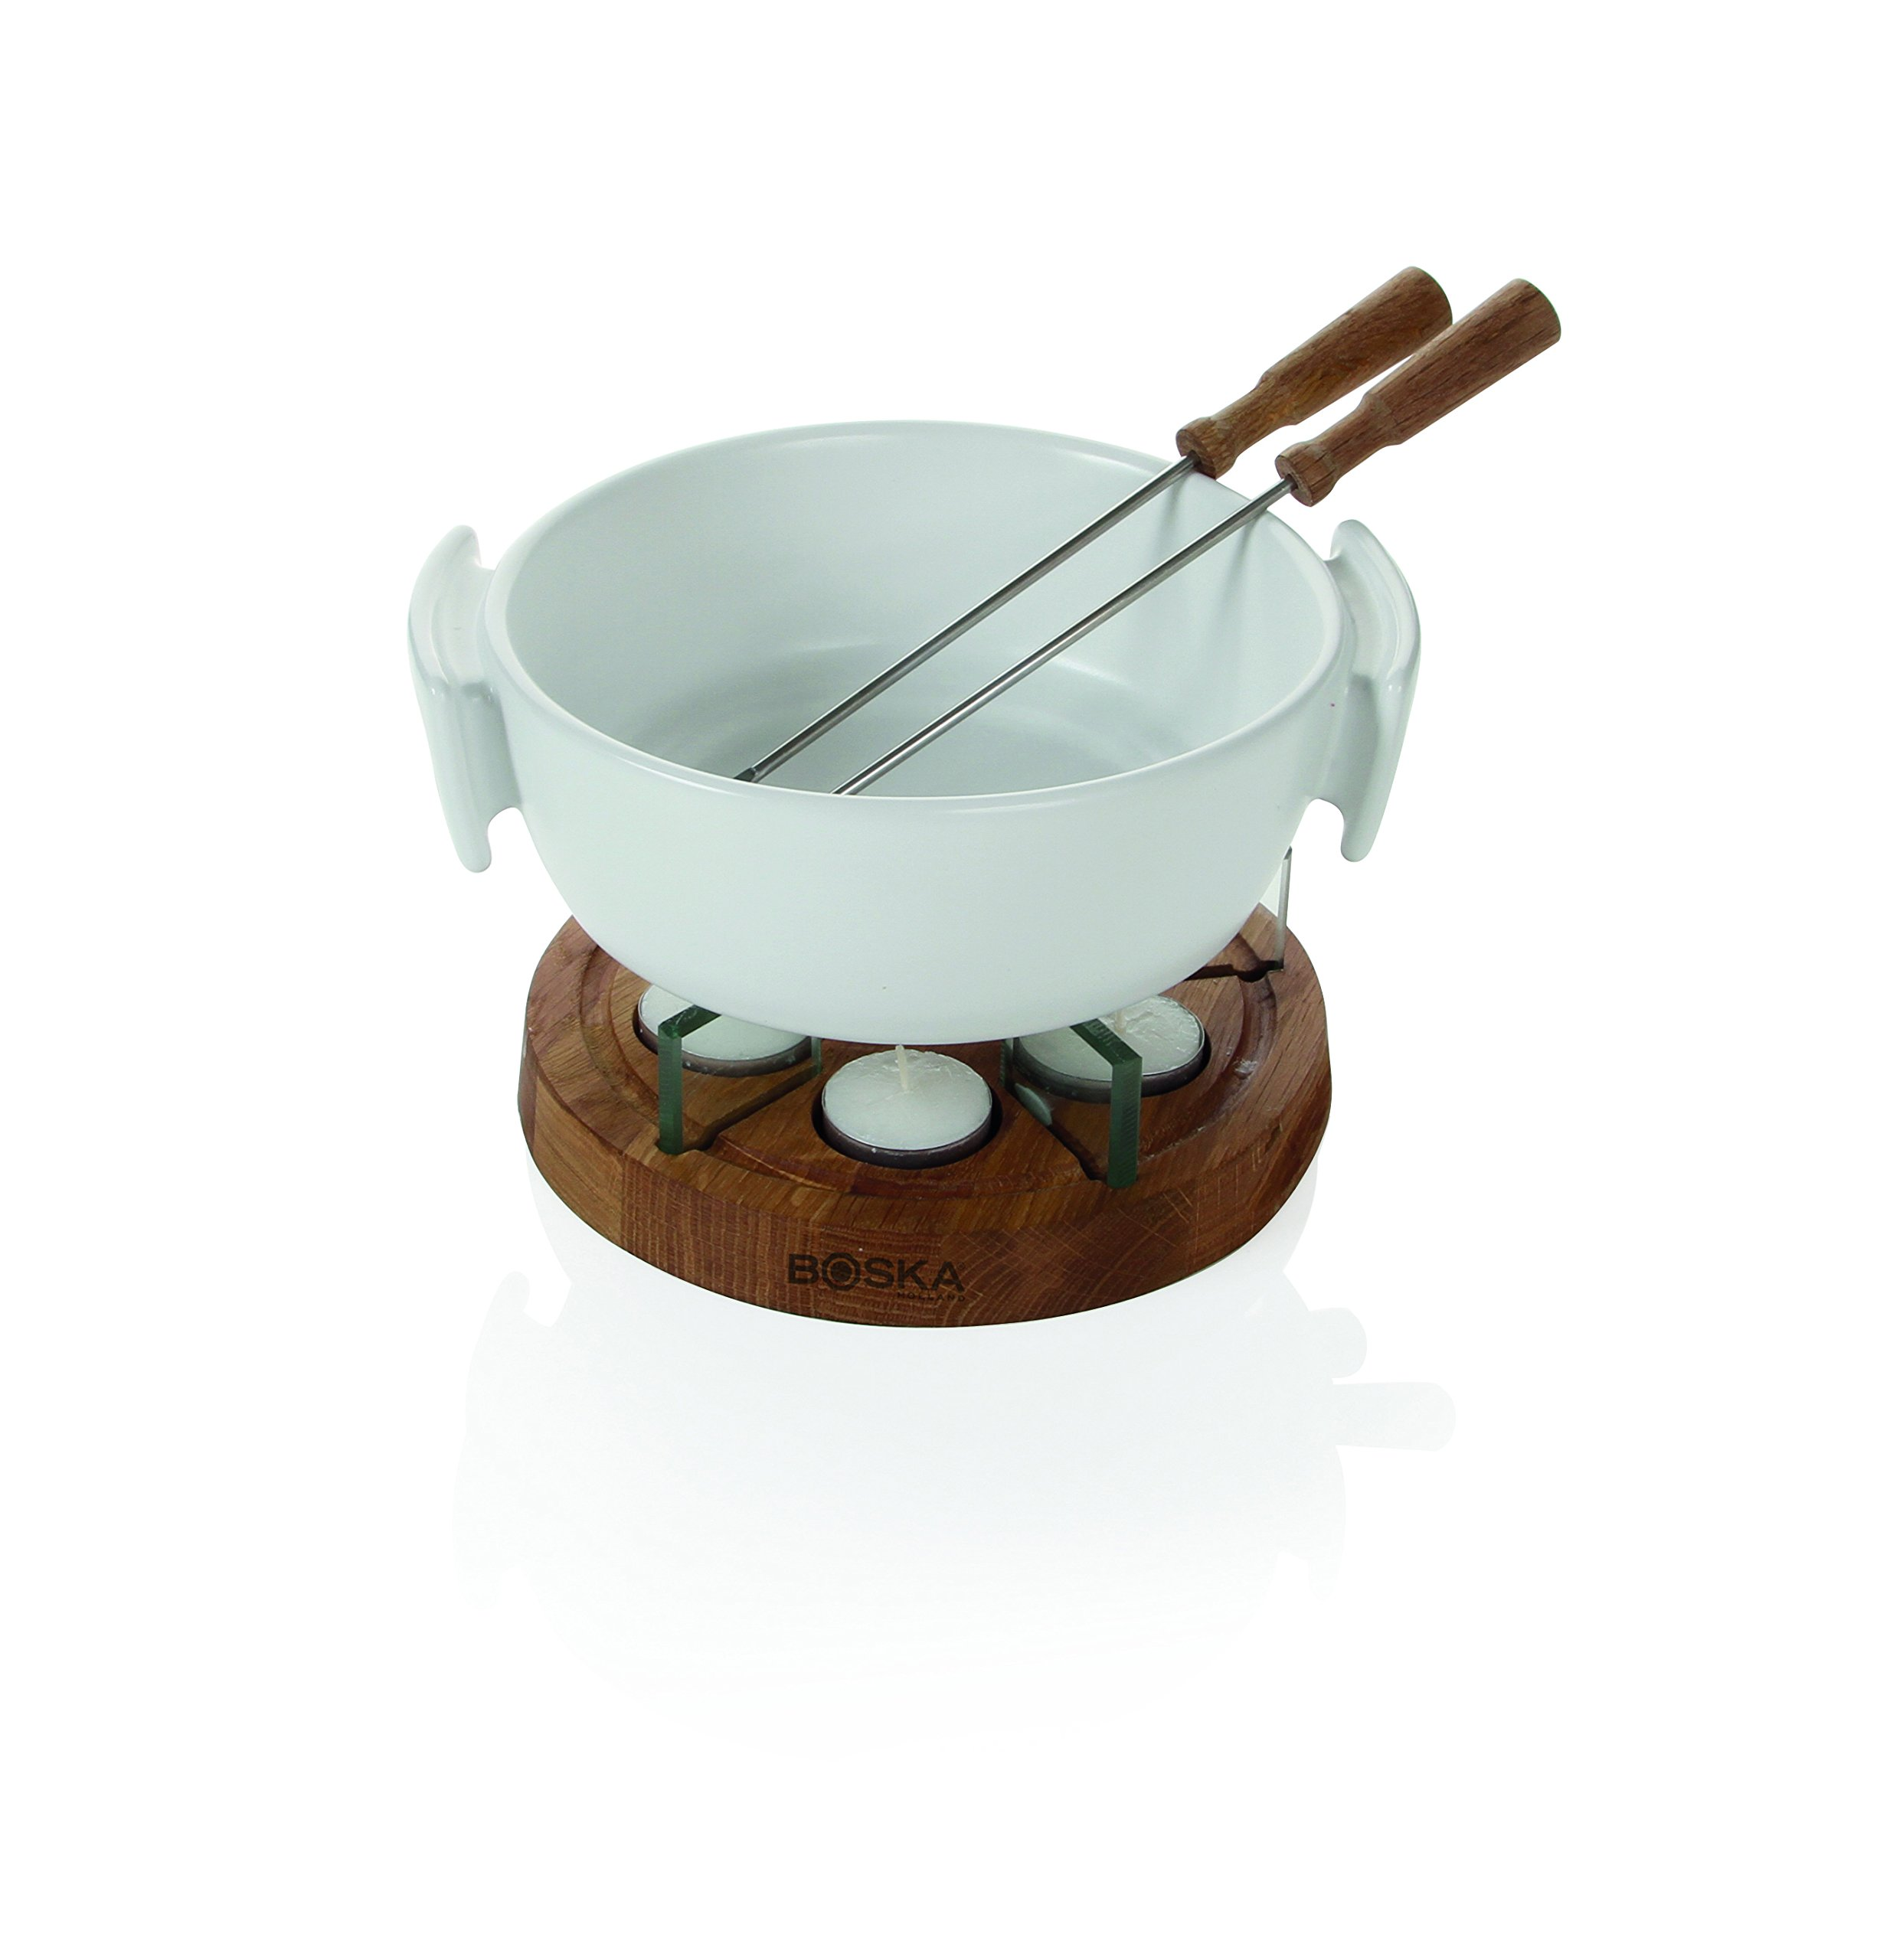 Boska Holland Tea Light Fondue Set with Oak Wood Base, 1 L White Stoneware Pot, Life Collection by Boska Holland (Image #2)